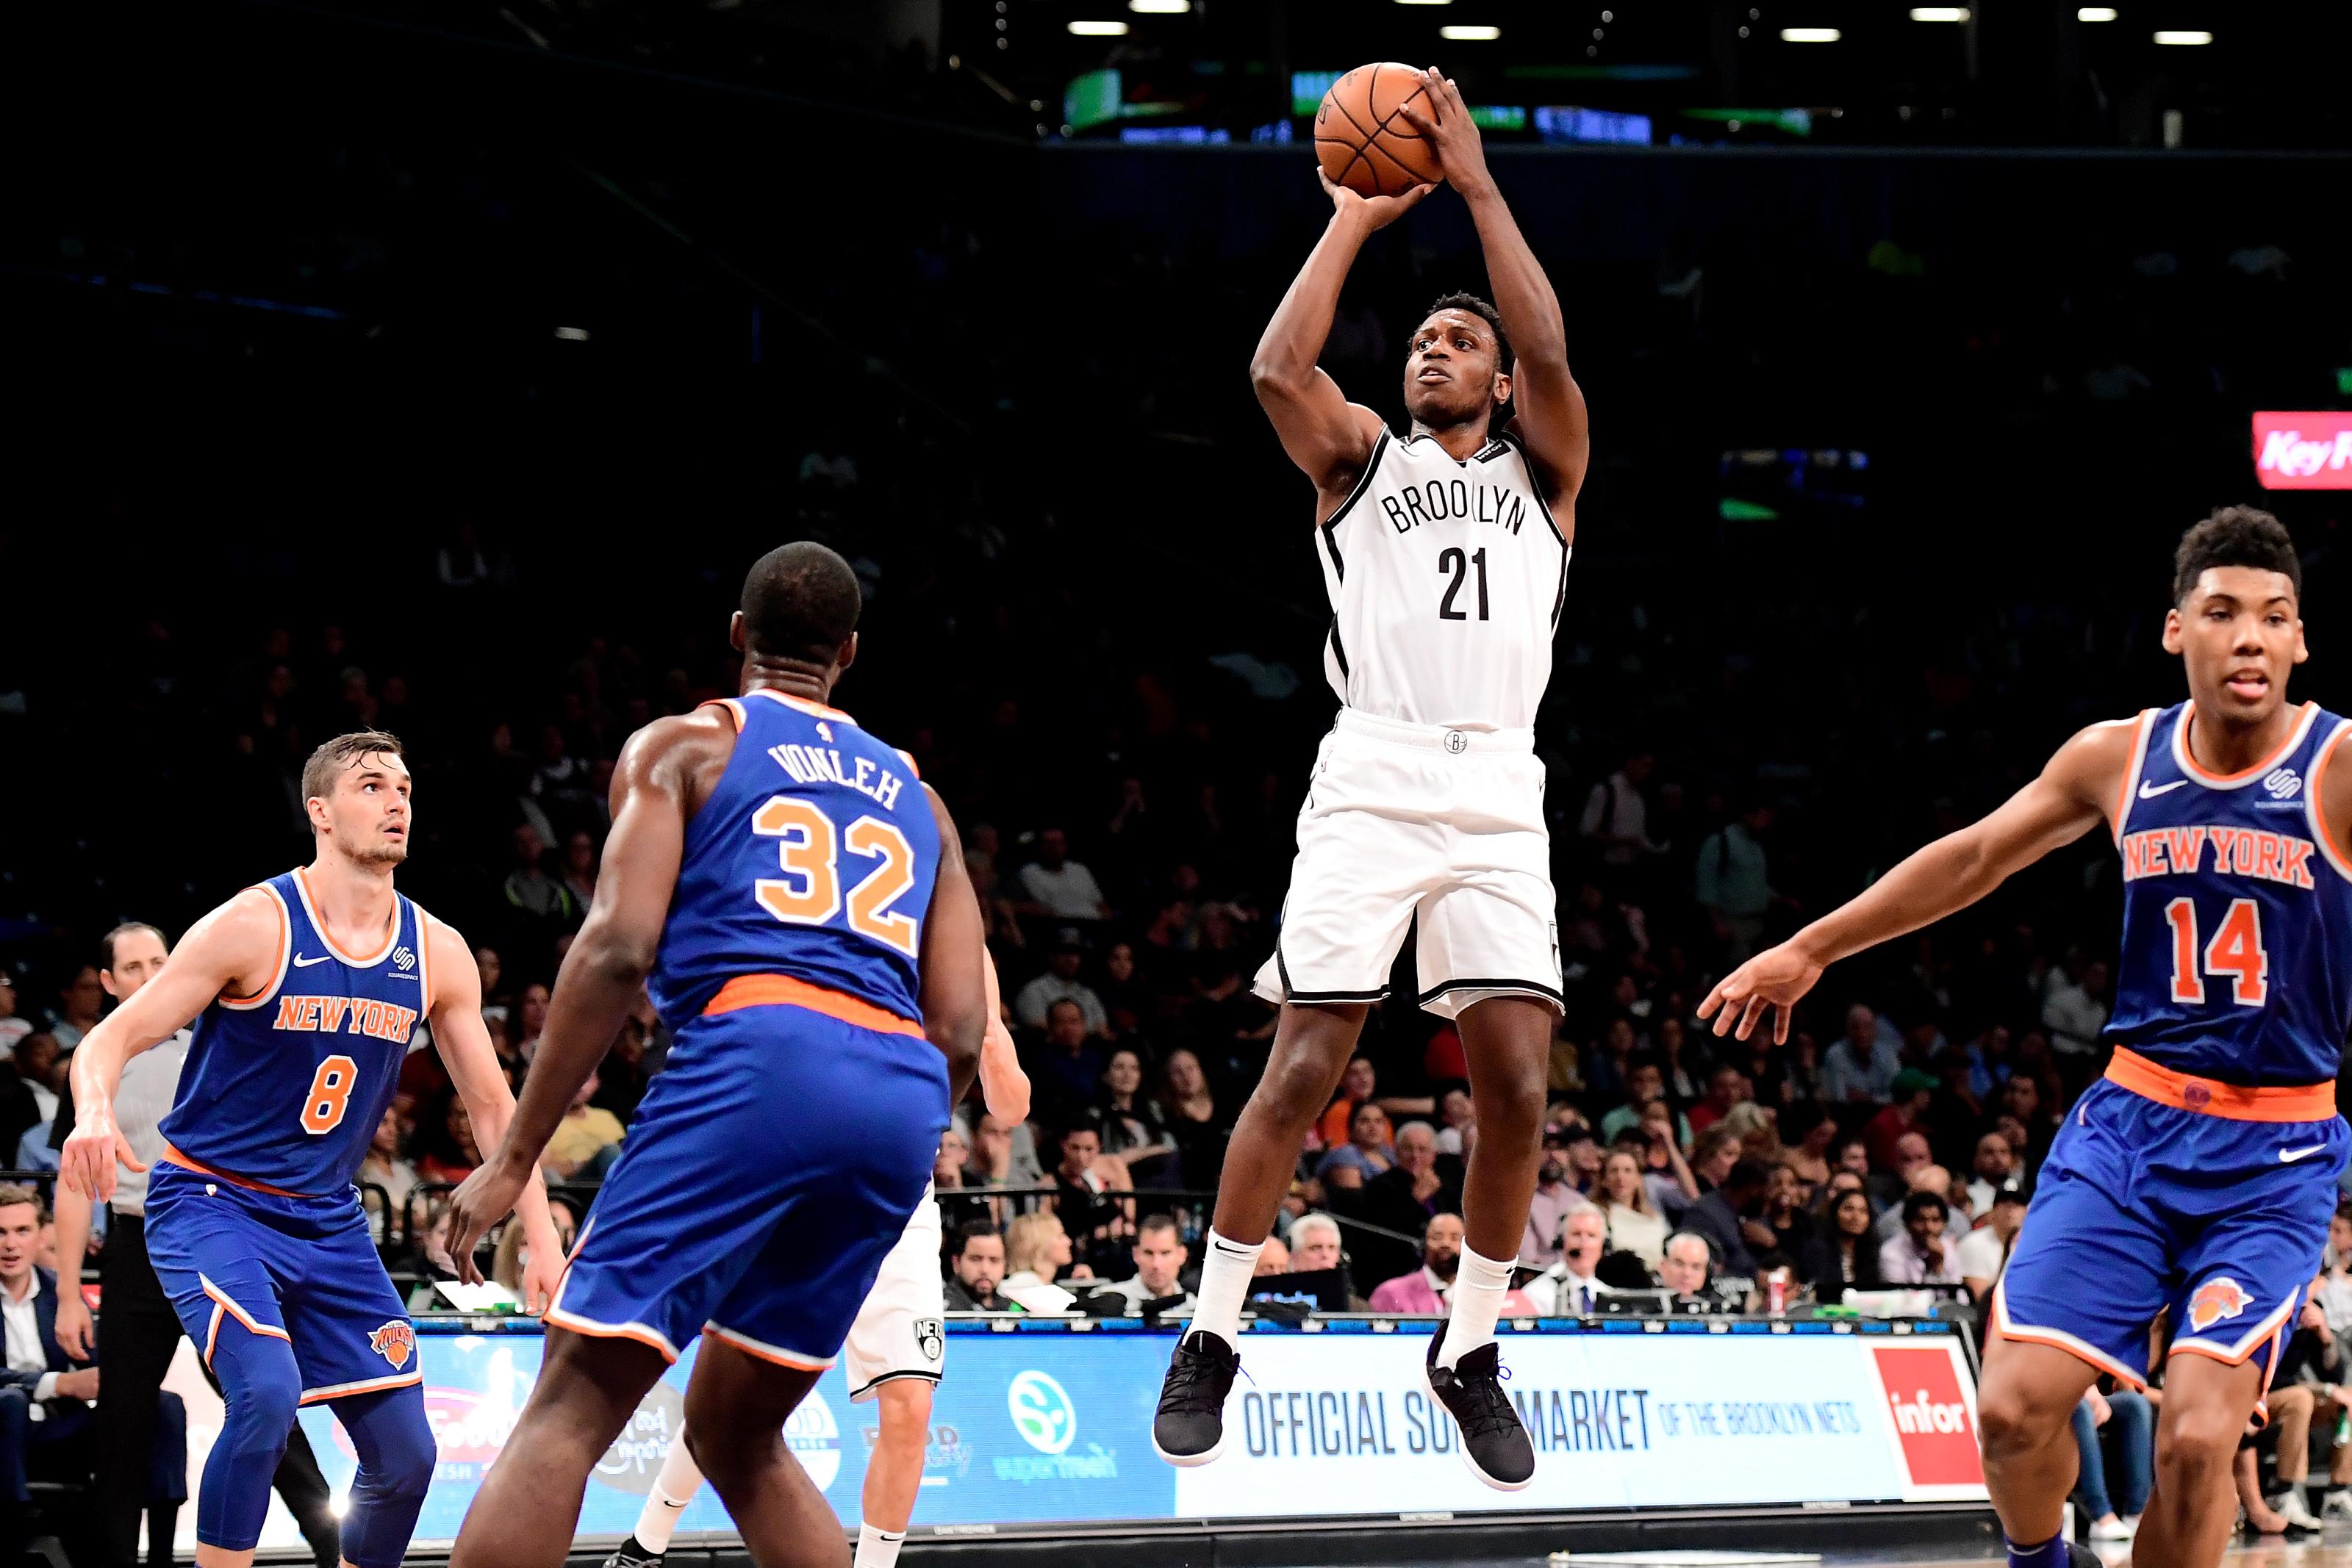 Brooklyn Nets at New York Knicks: TV, live stream, injury report